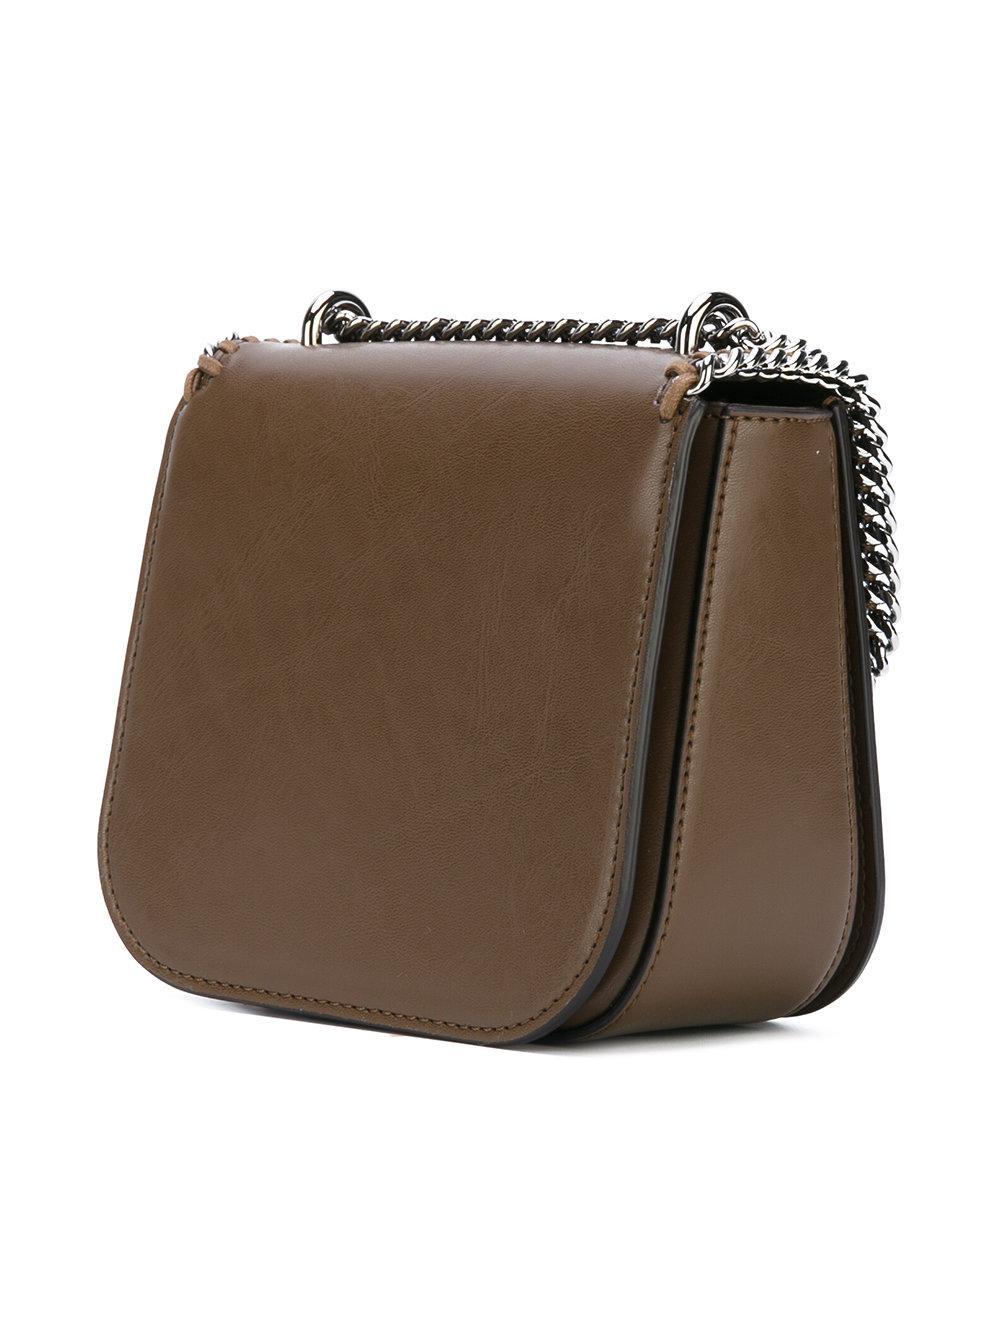 lyst stella mccartney mini falabella box shoulder bag in brown. Black Bedroom Furniture Sets. Home Design Ideas